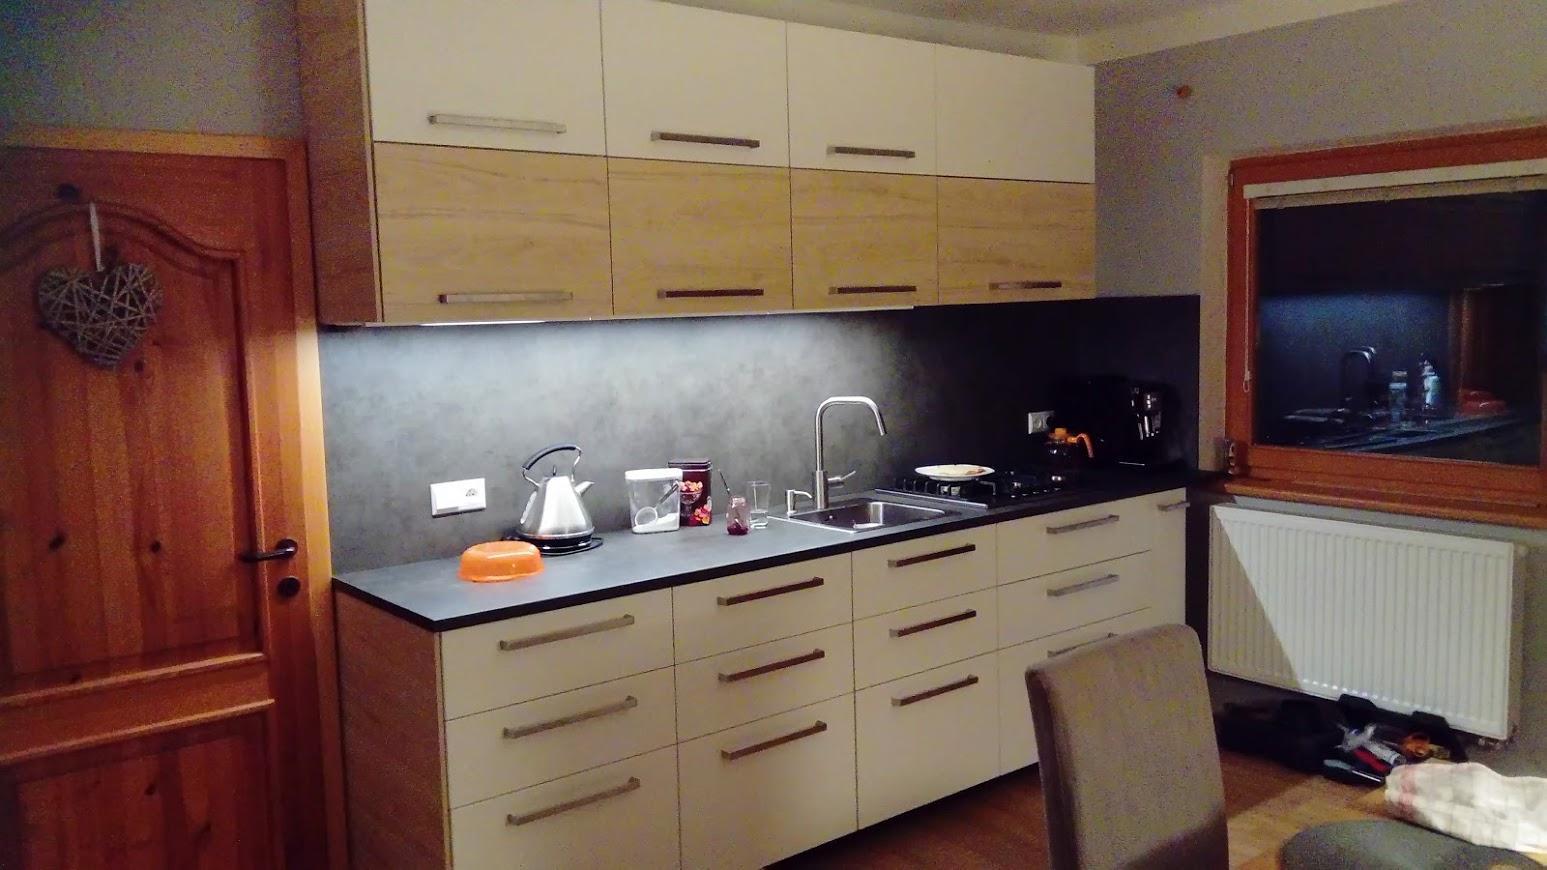 Kuchyň - Obrázek č. 1